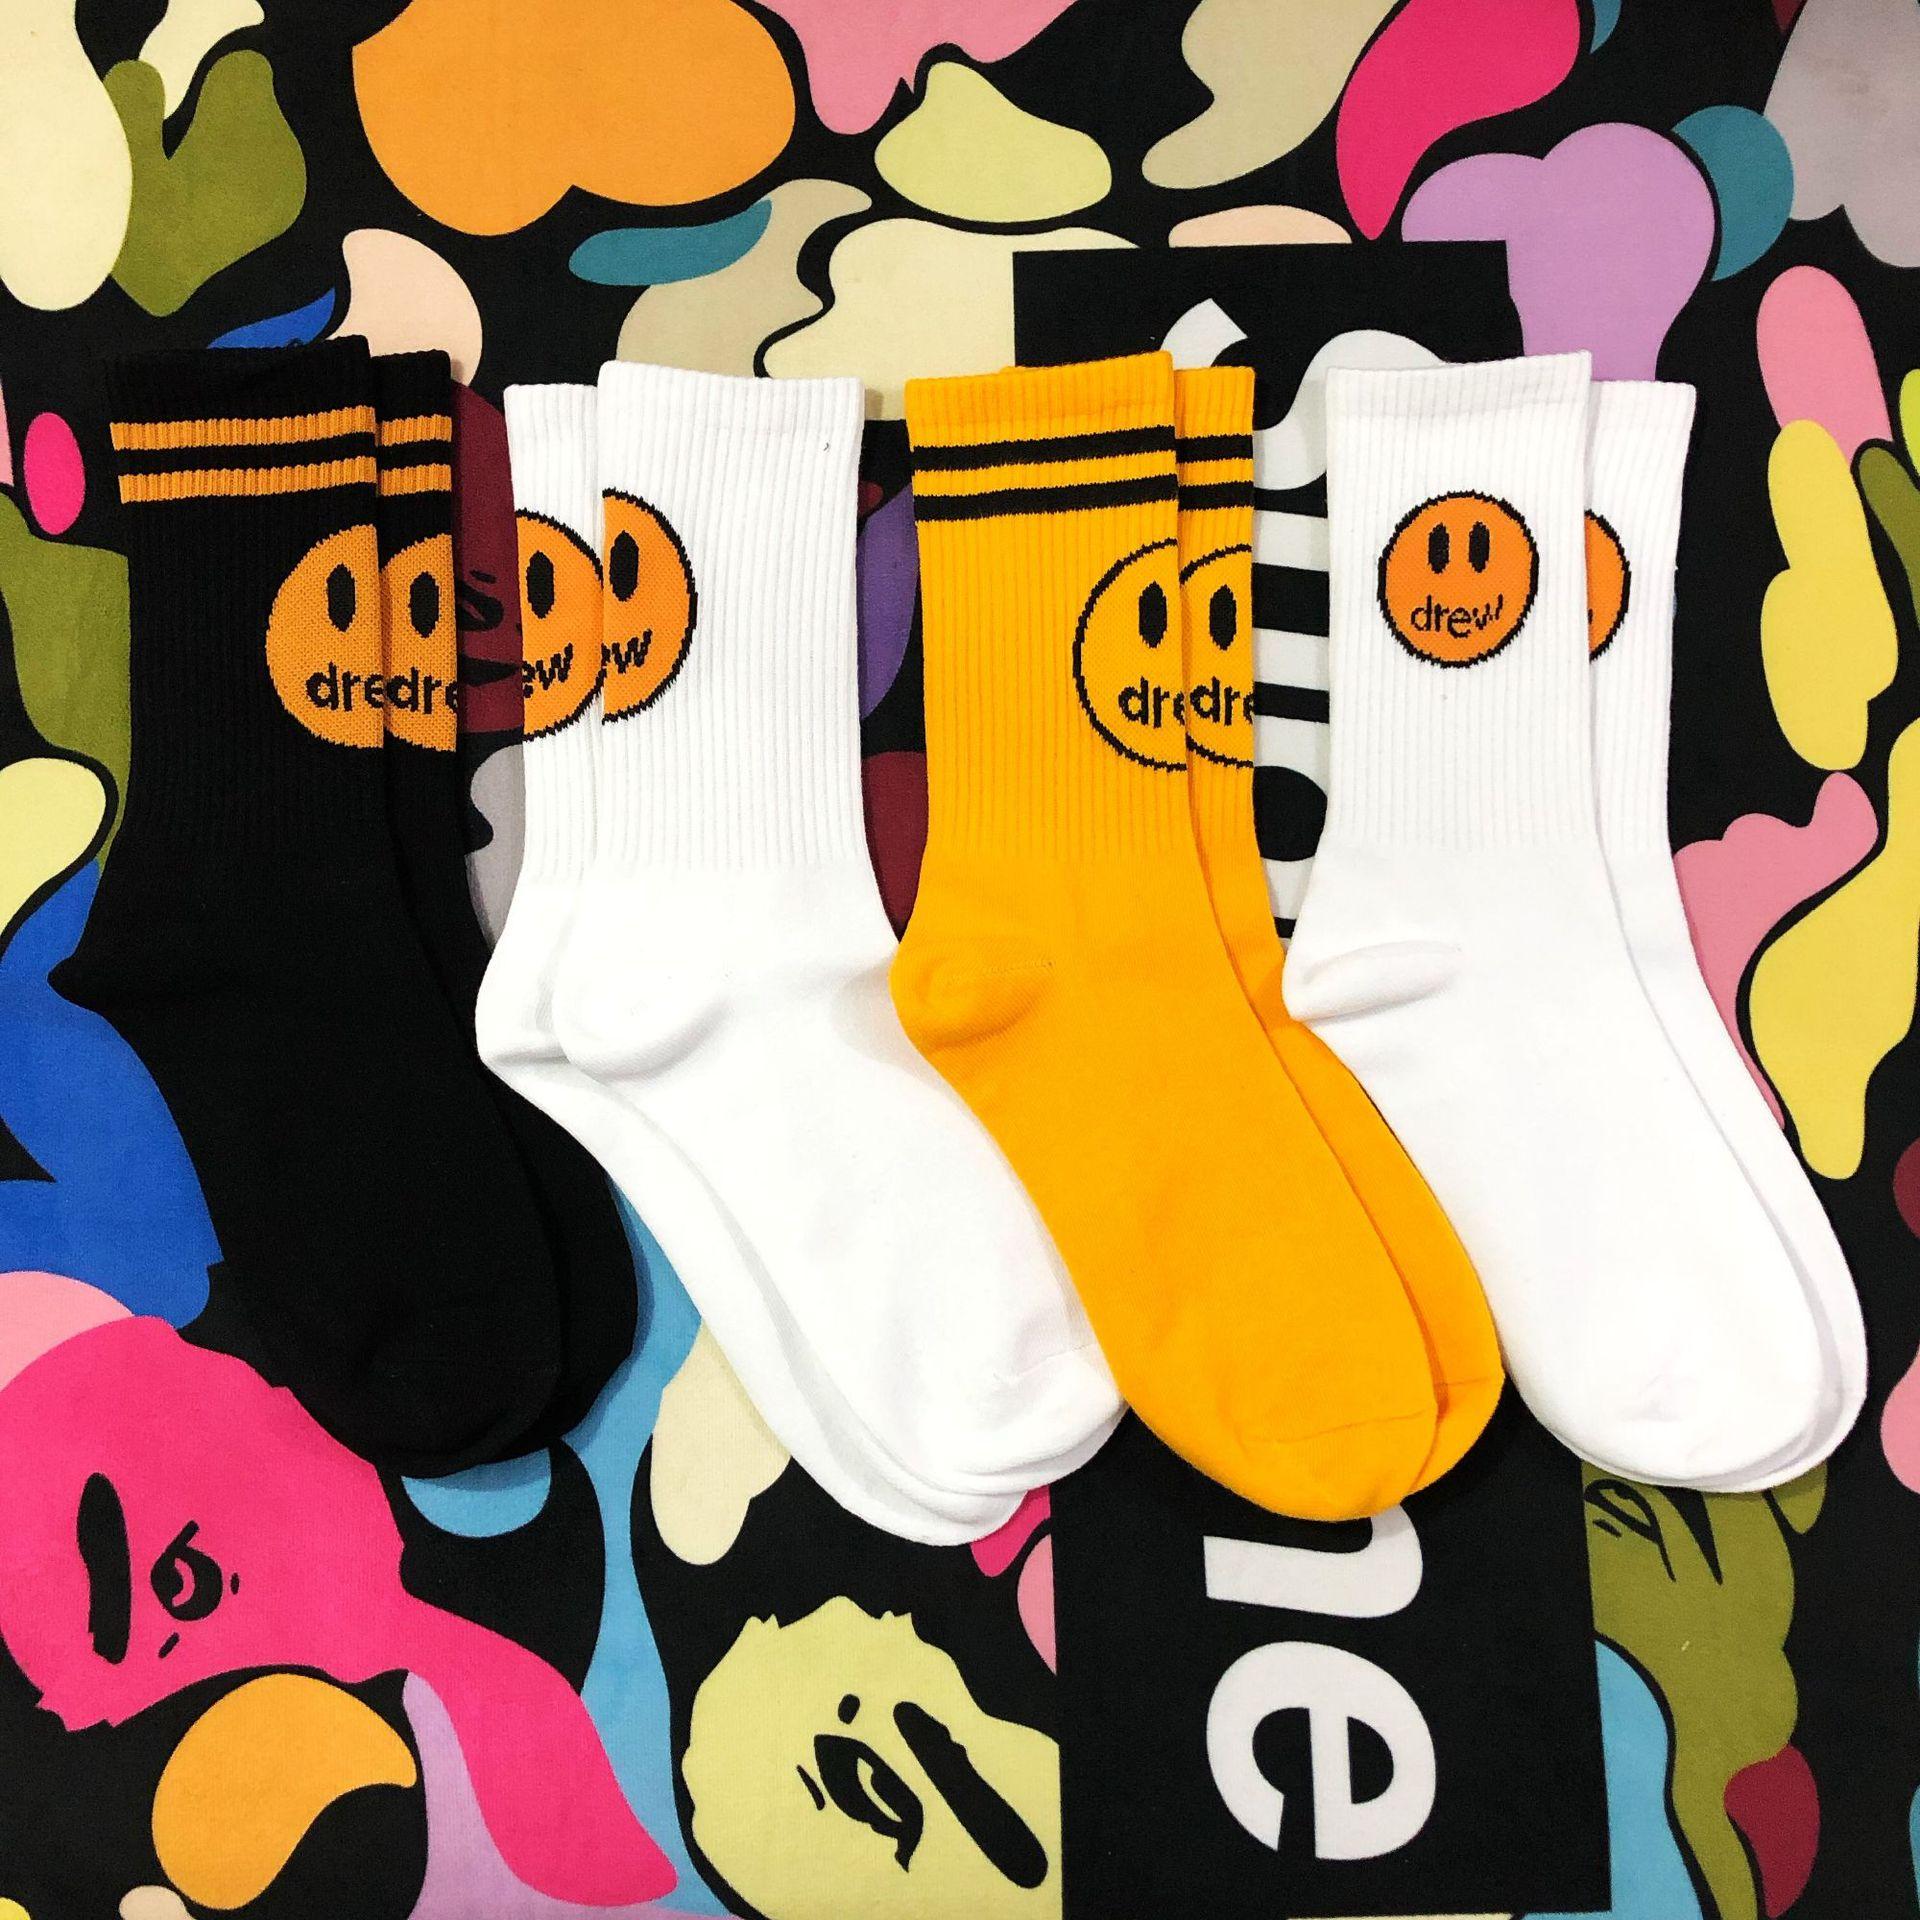 Adult Mid Calf Crew Socks Justin Bieber JB JBiebs Sox Drew Smile Face Drew House Drews Collection New Logo Fashion Wear Brand 20